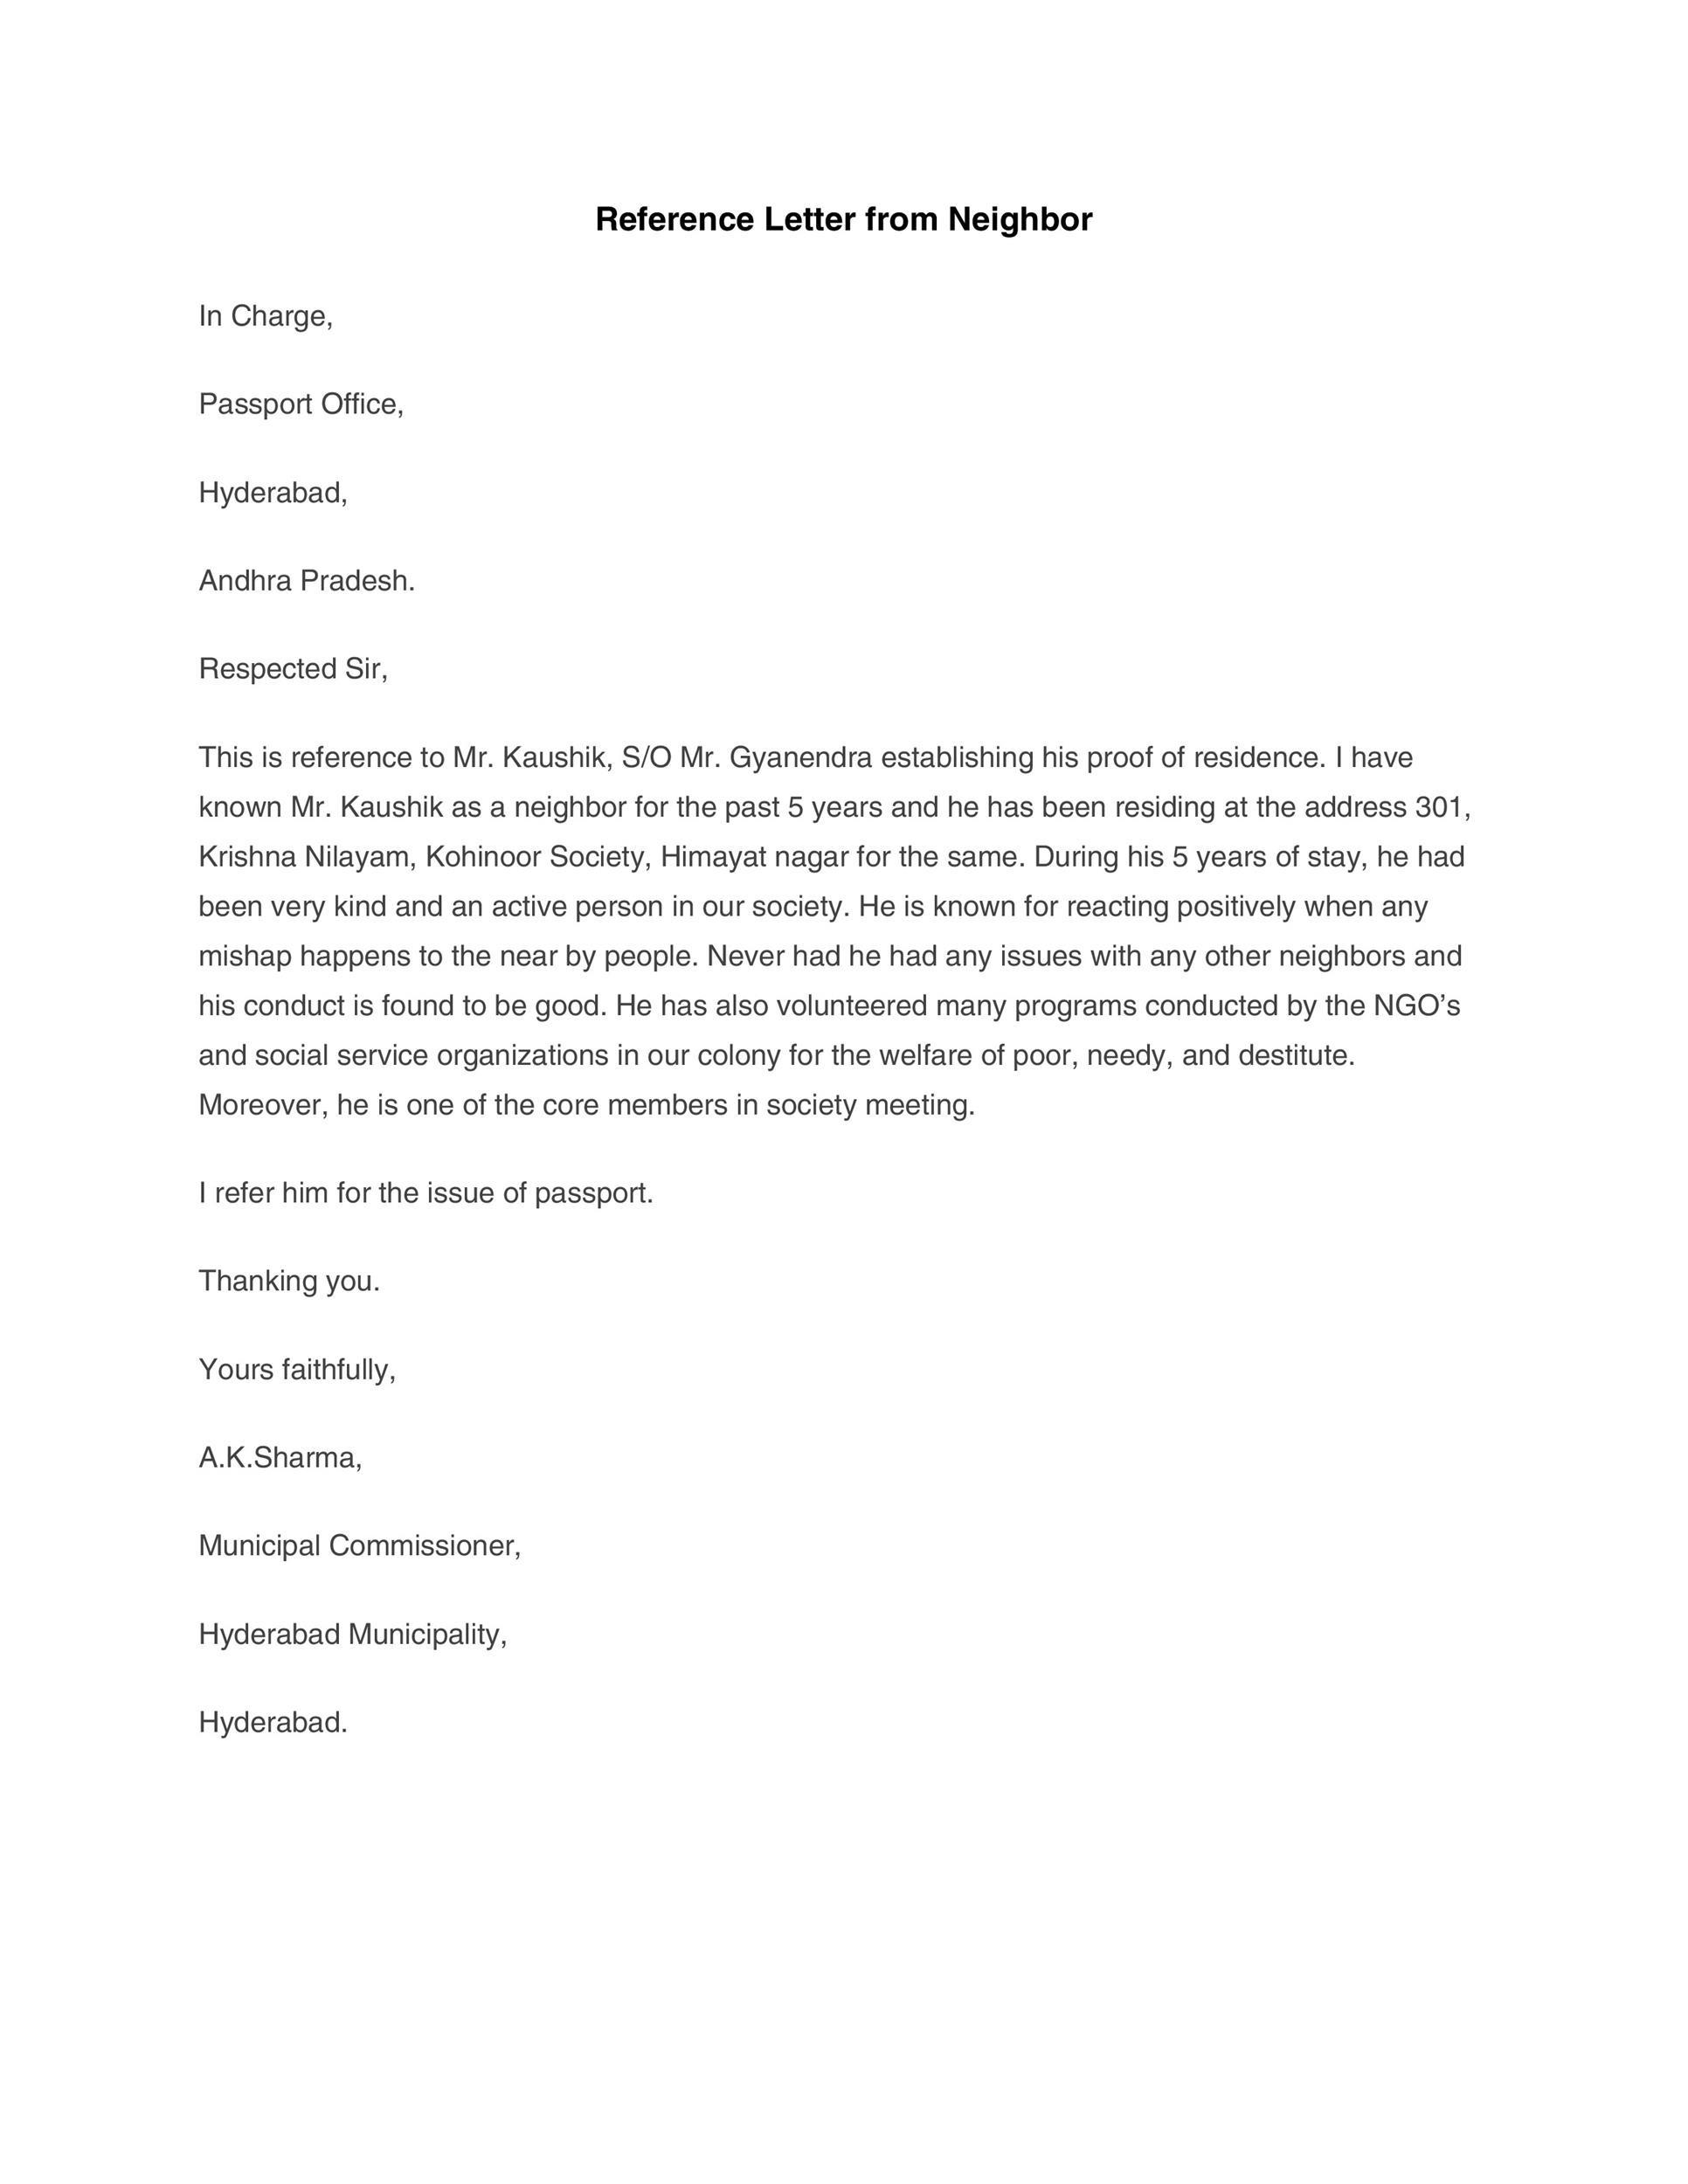 Reference letter 26